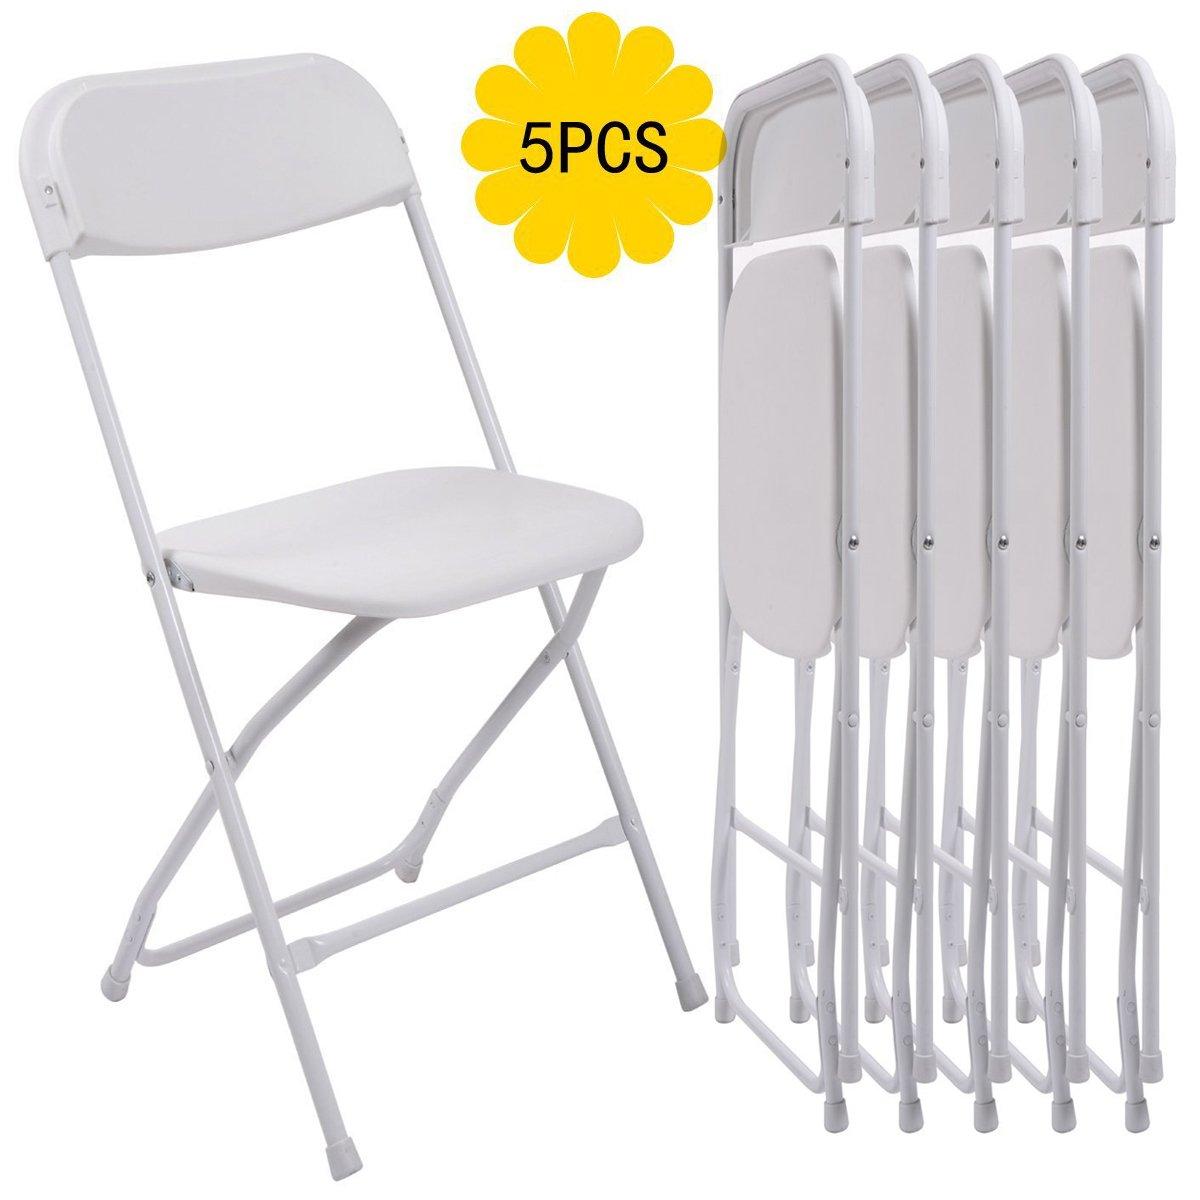 Amazon.com: bonnlo Juego de 5 sillas apilable resistente ...